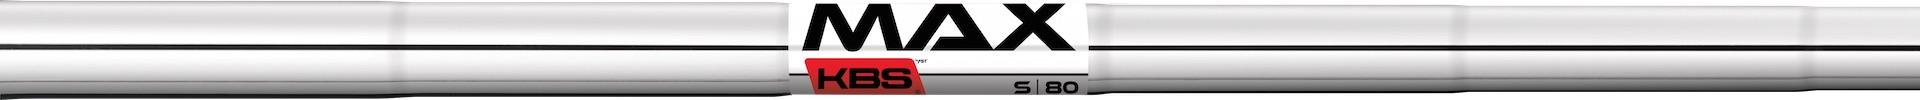 KBS MAX 80 Steel Shaft